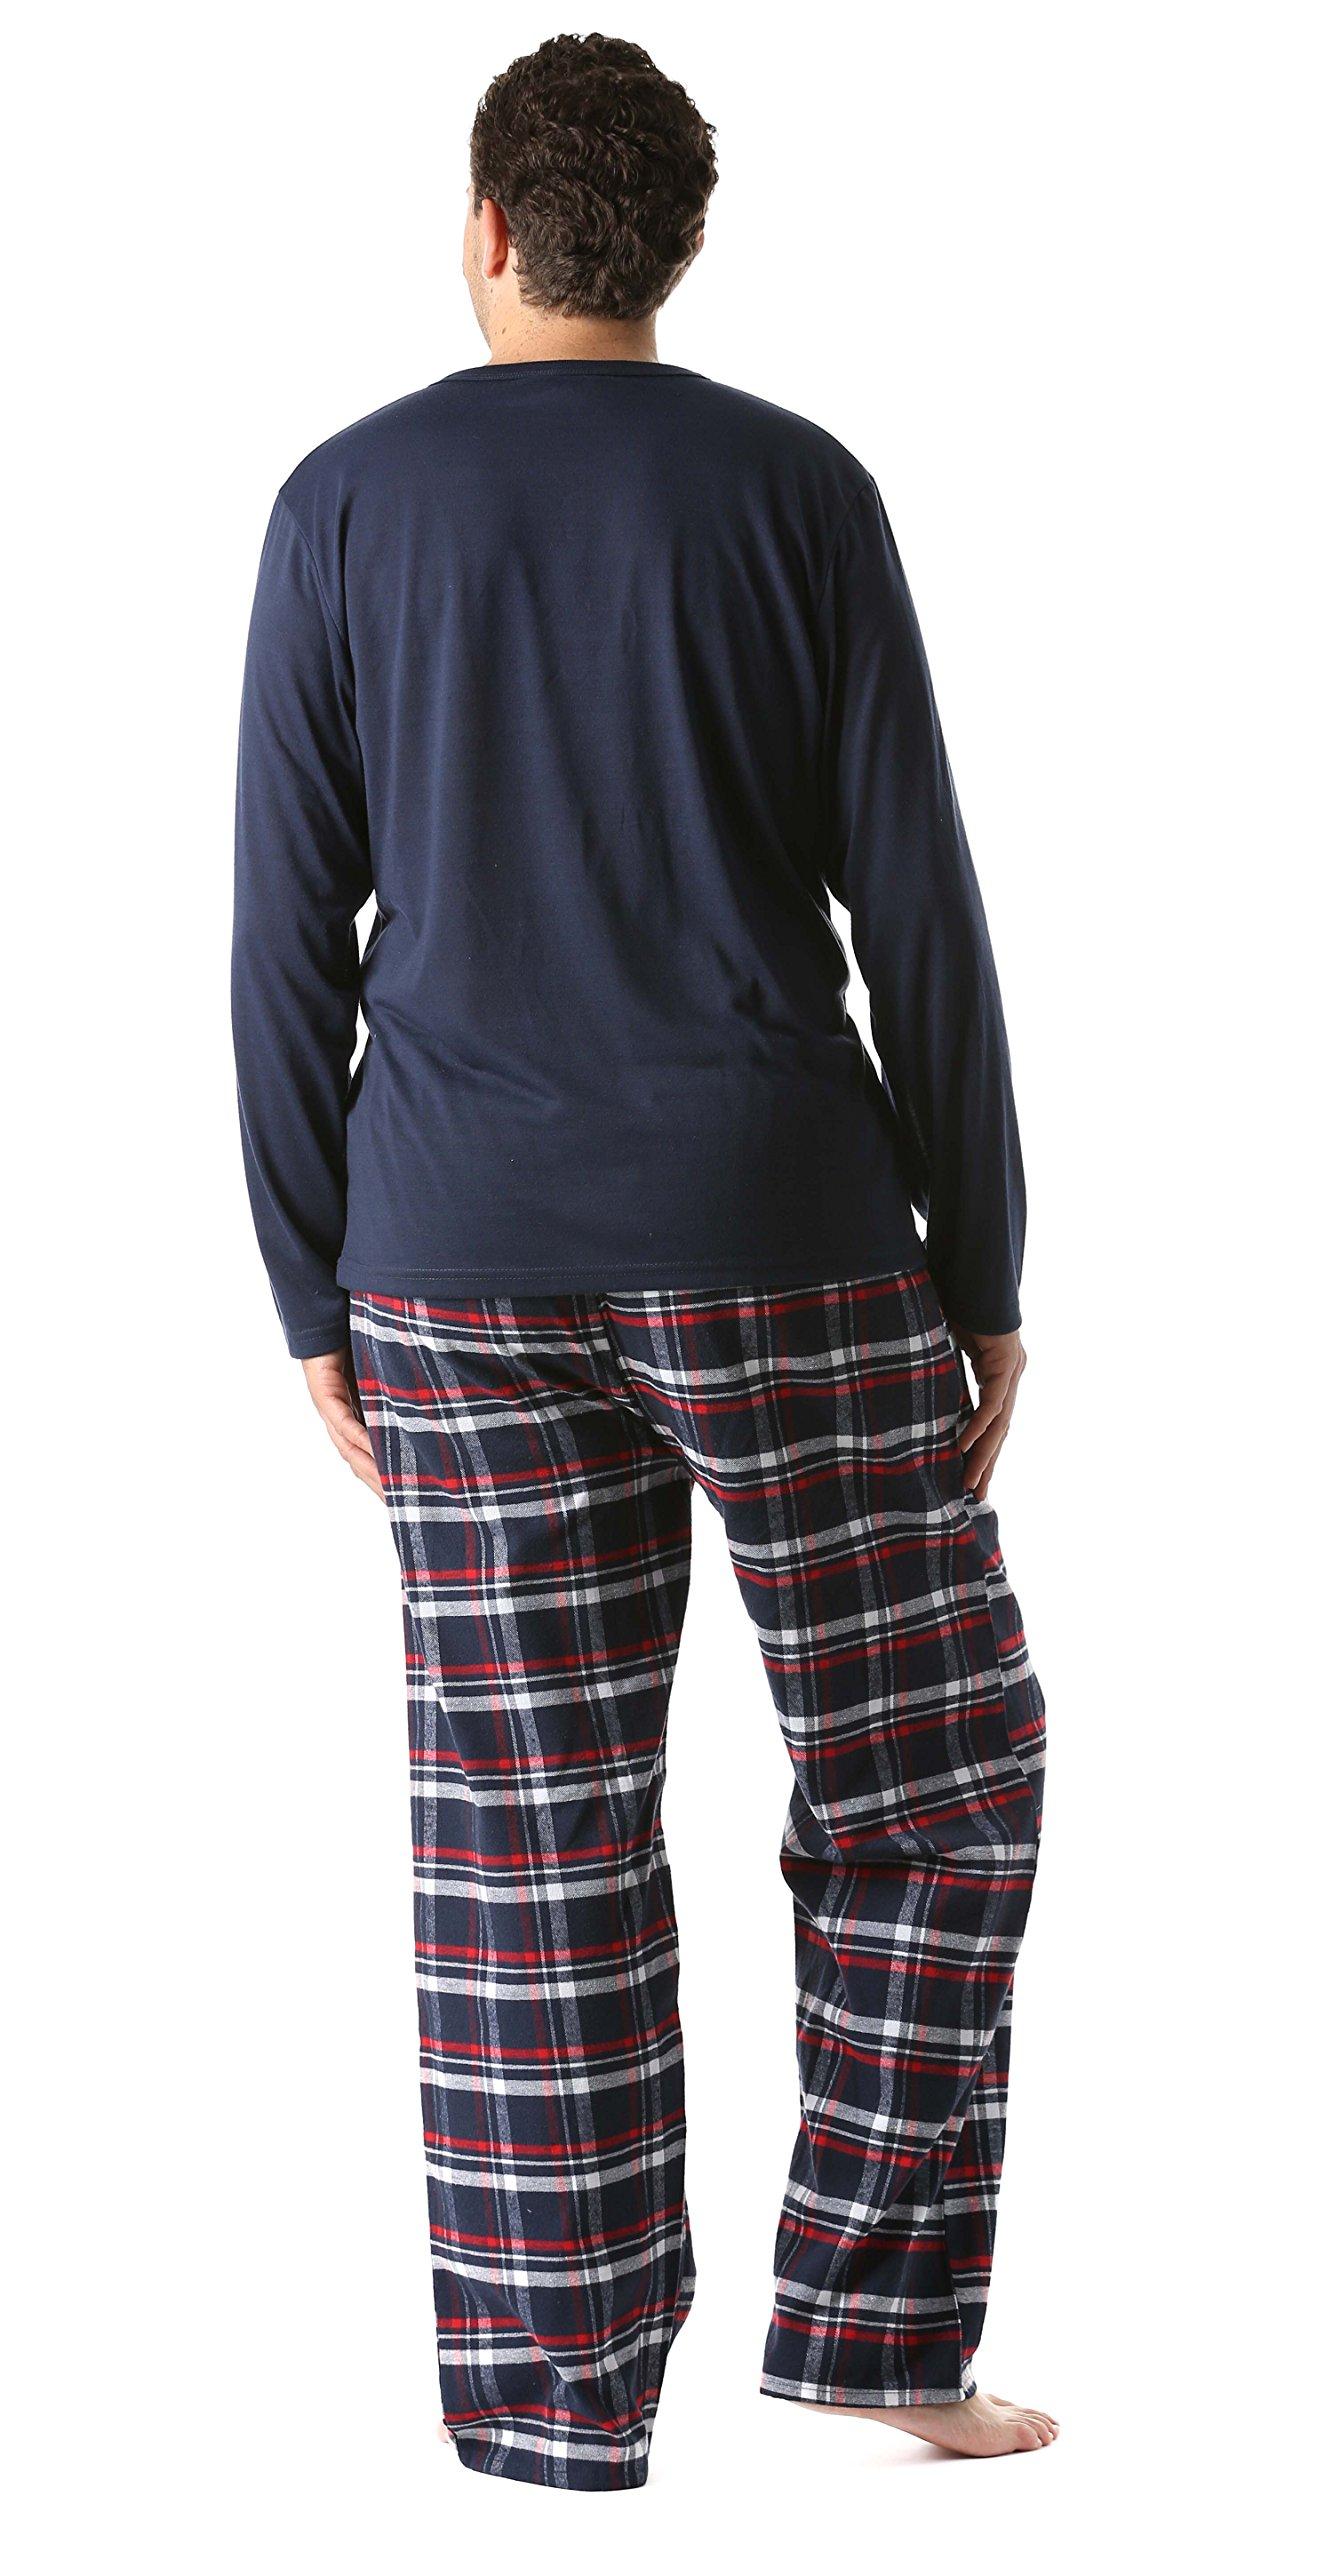 Men S 2 Piece Cotton Blend Flannel Pajama Set With 2